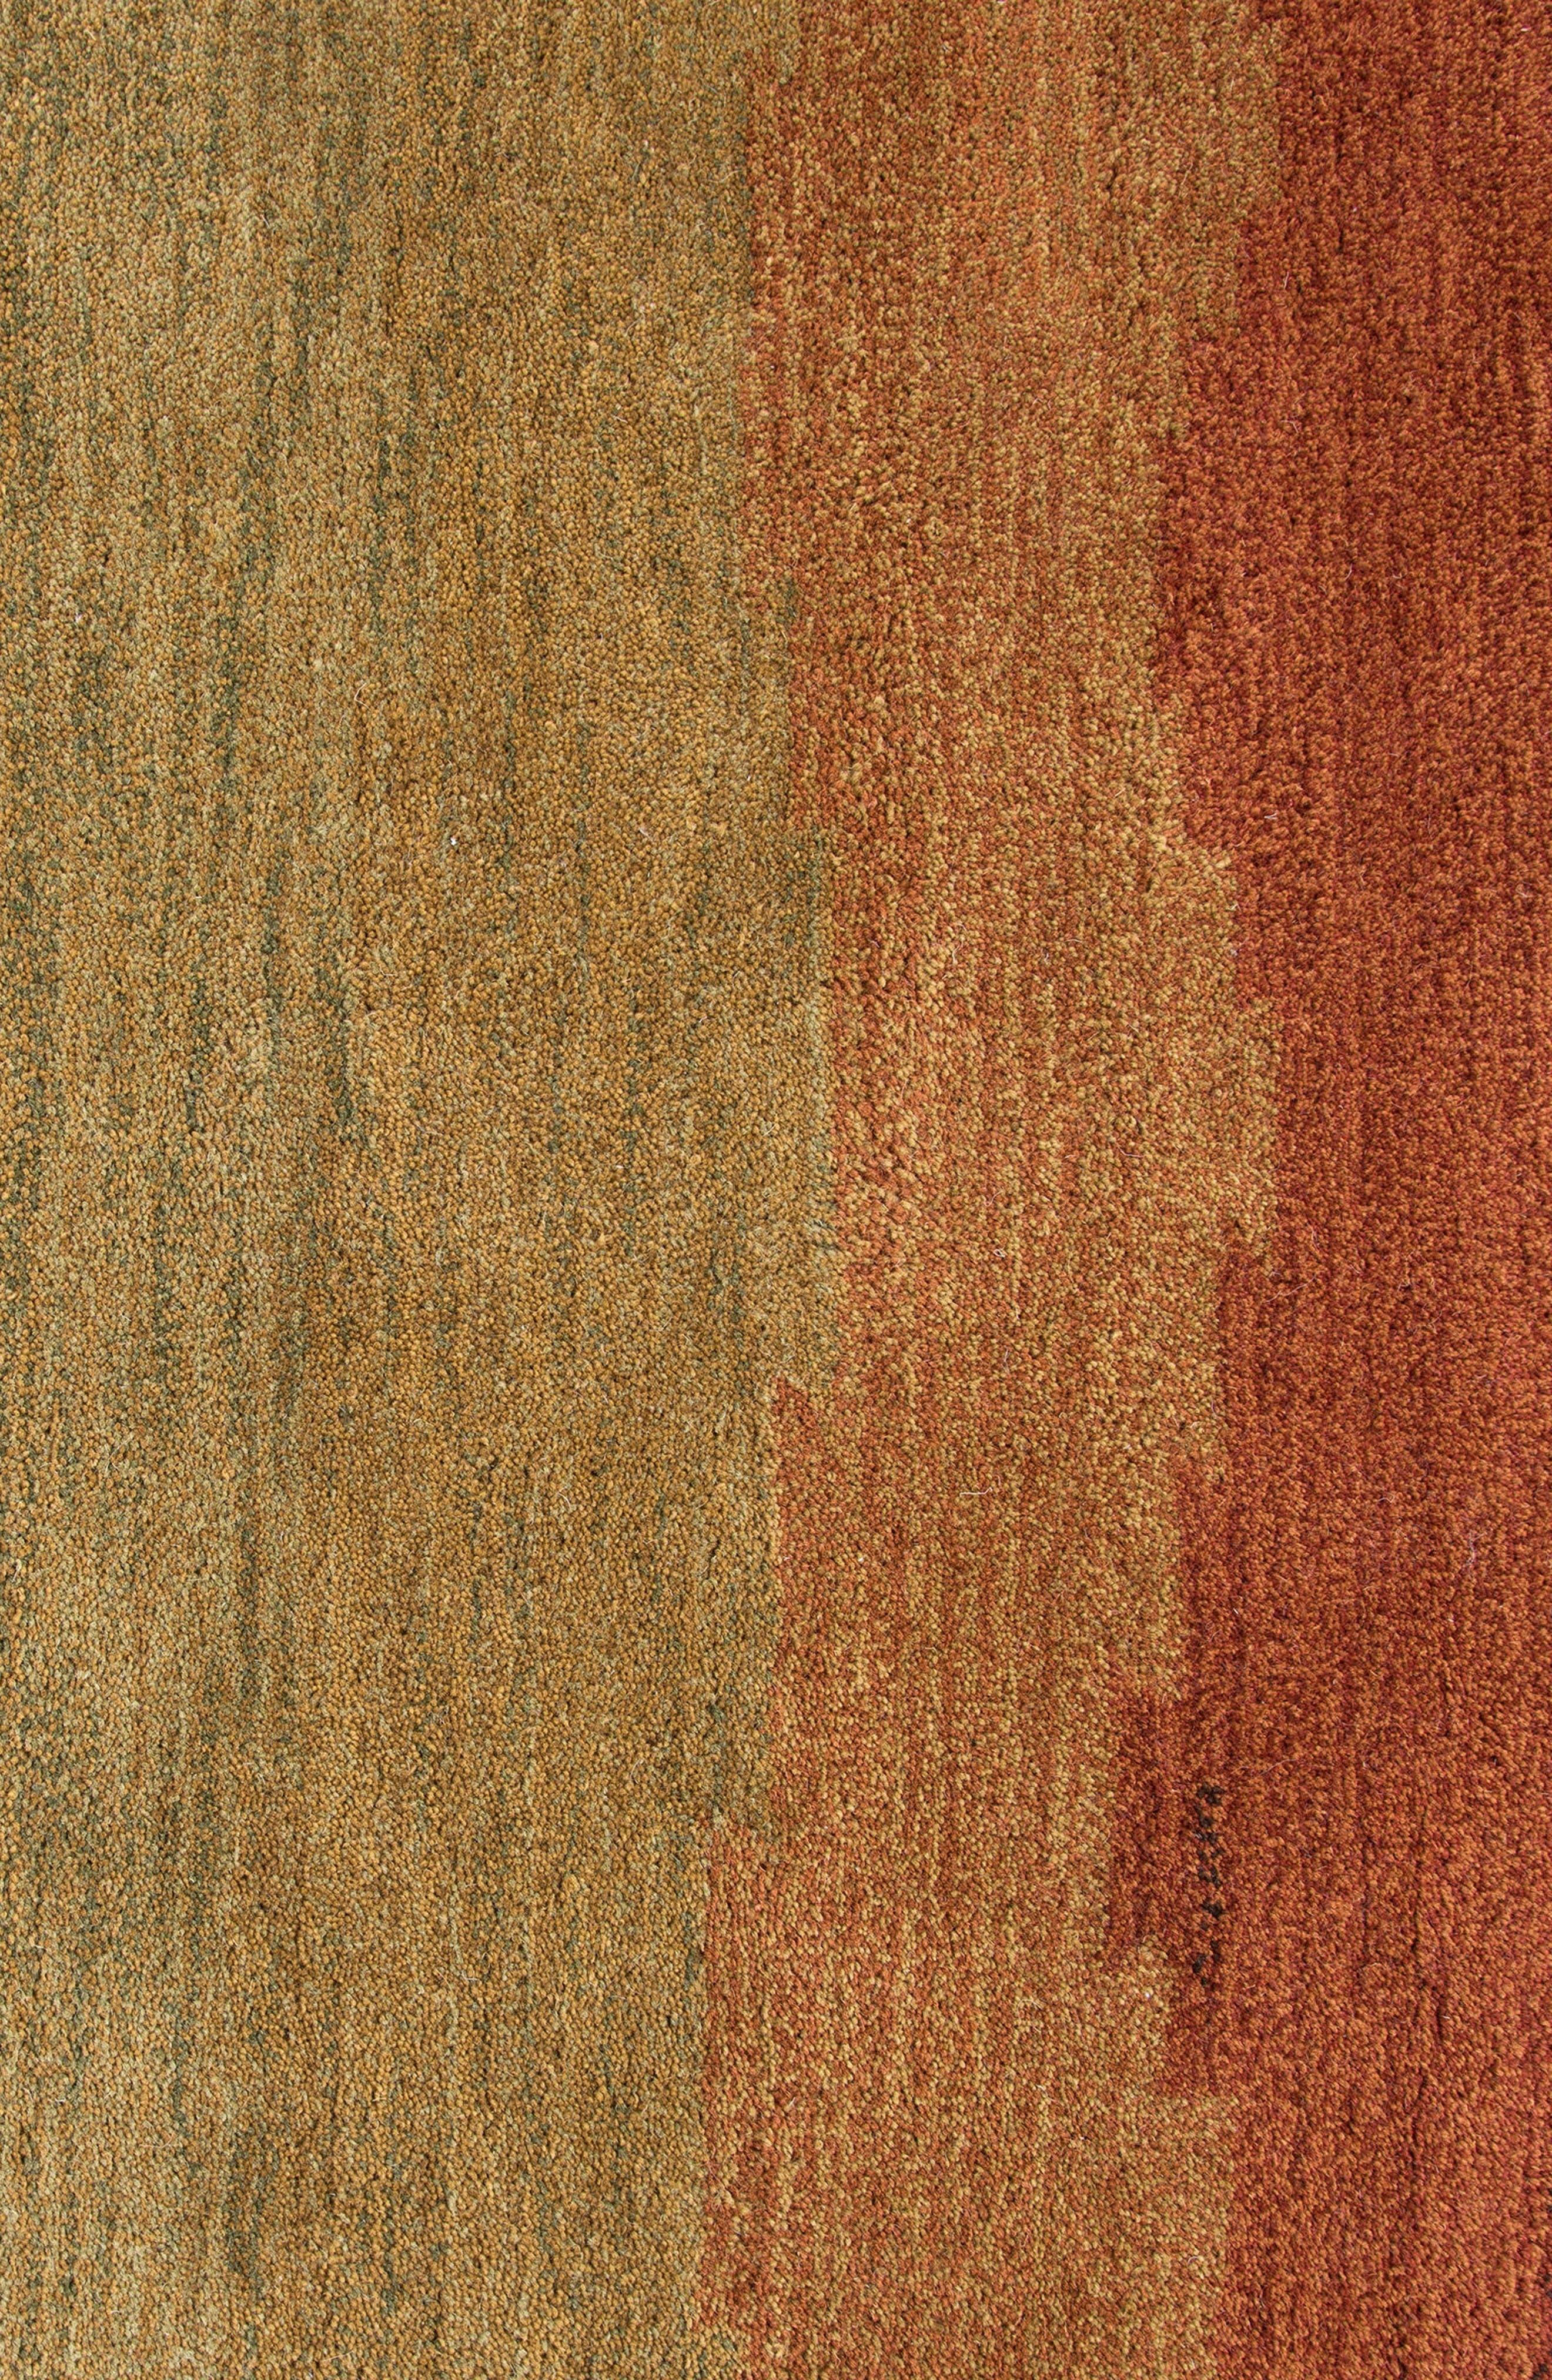 Desert Oasis Hand Tufted Wool Area Rug,                             Alternate thumbnail 5, color,                             Rust